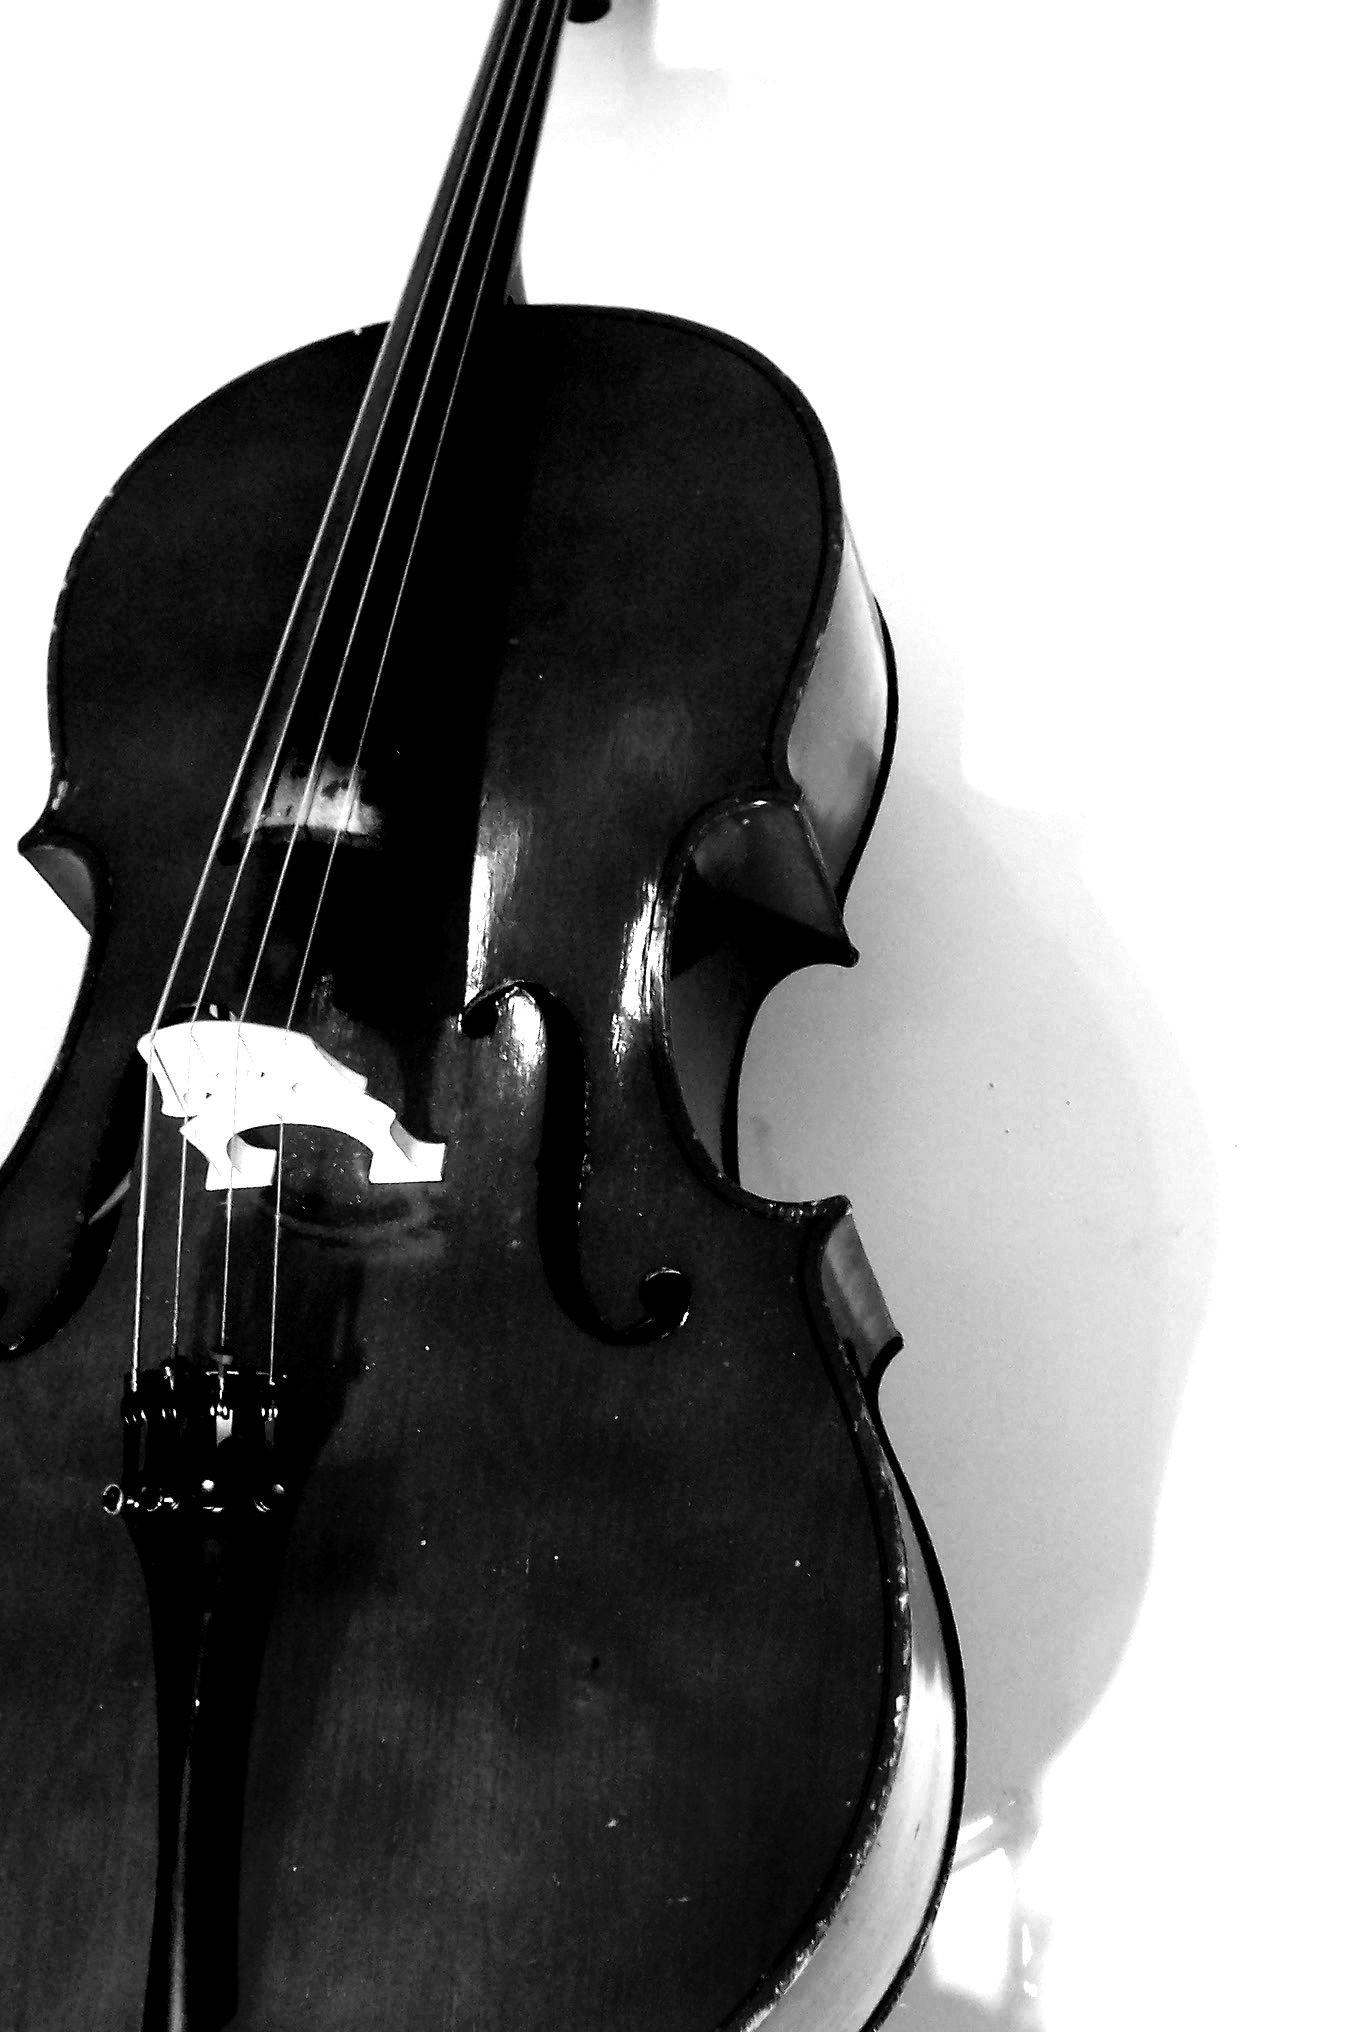 black violin wallpaper hd